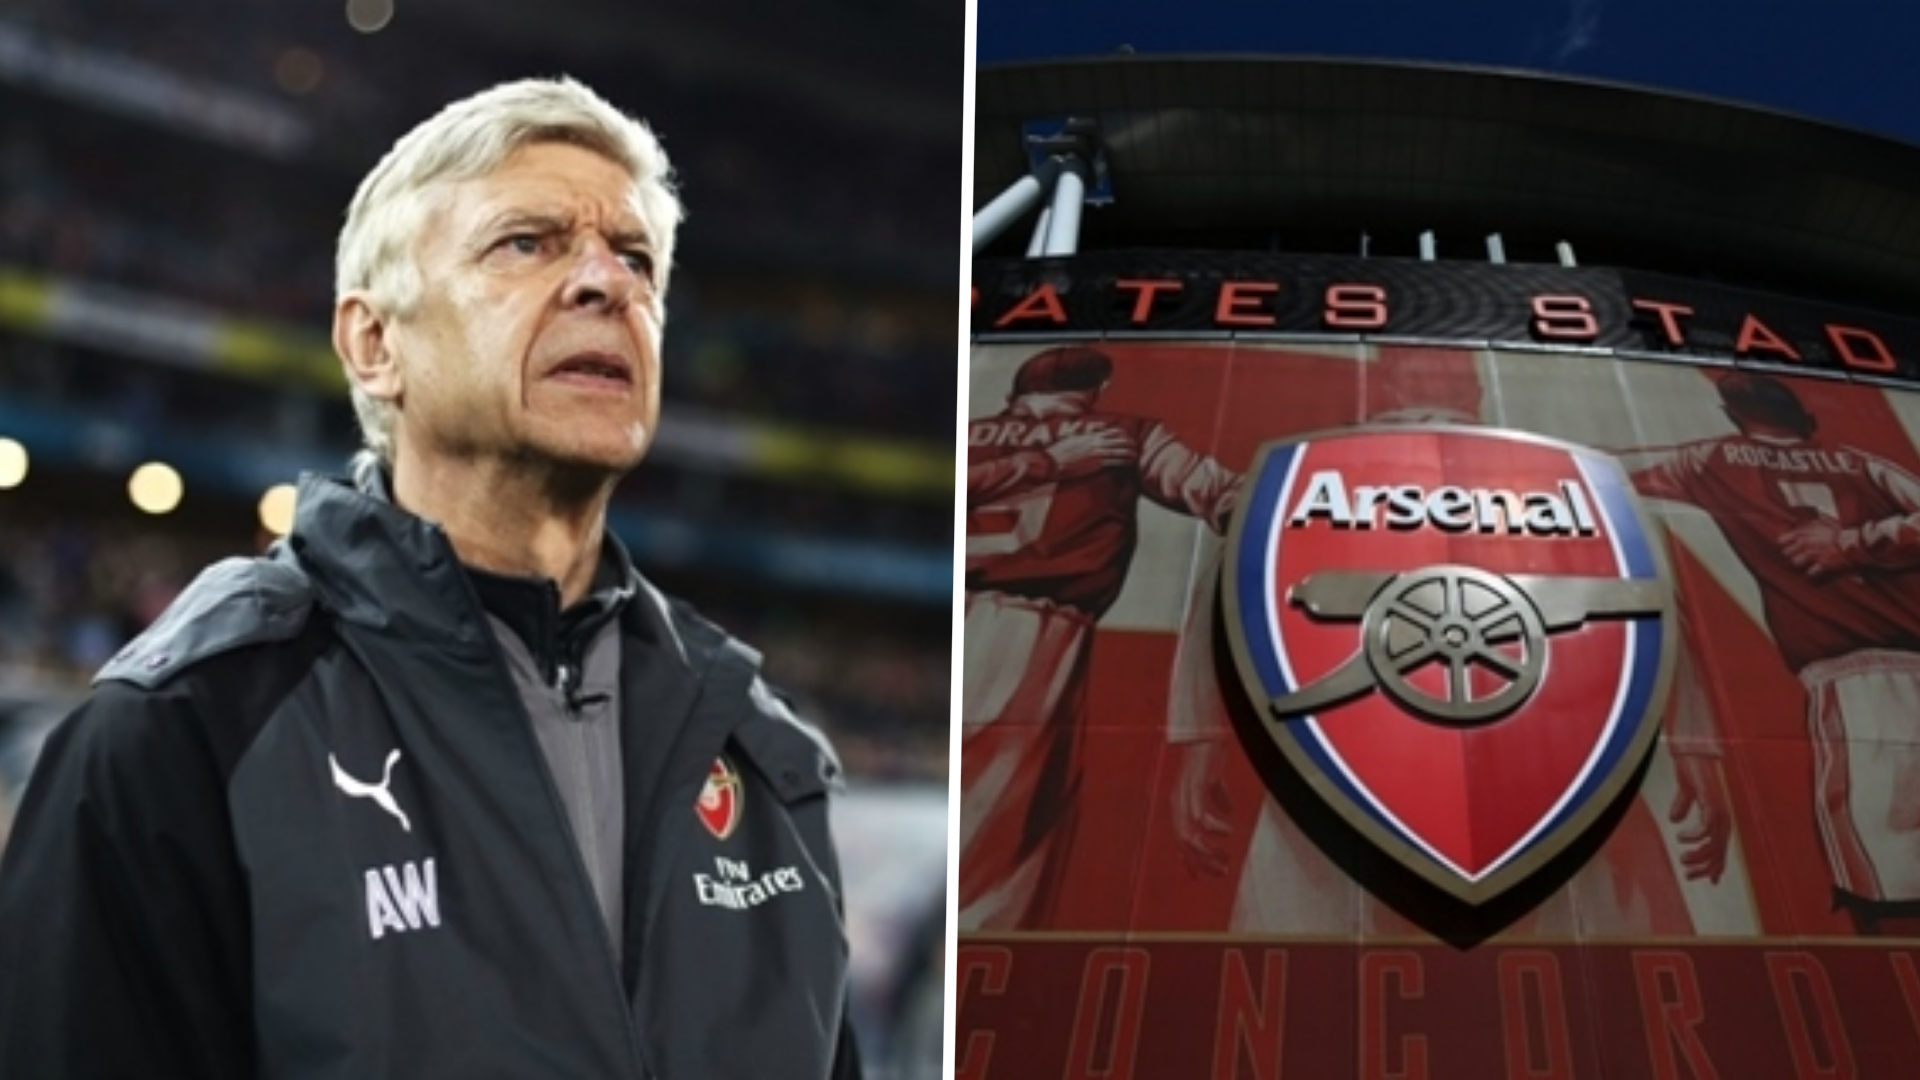 'Arsenal should get Wenger back, he'd help land top targets' – Former boss 'no threat' to Arteta, says Nicholas